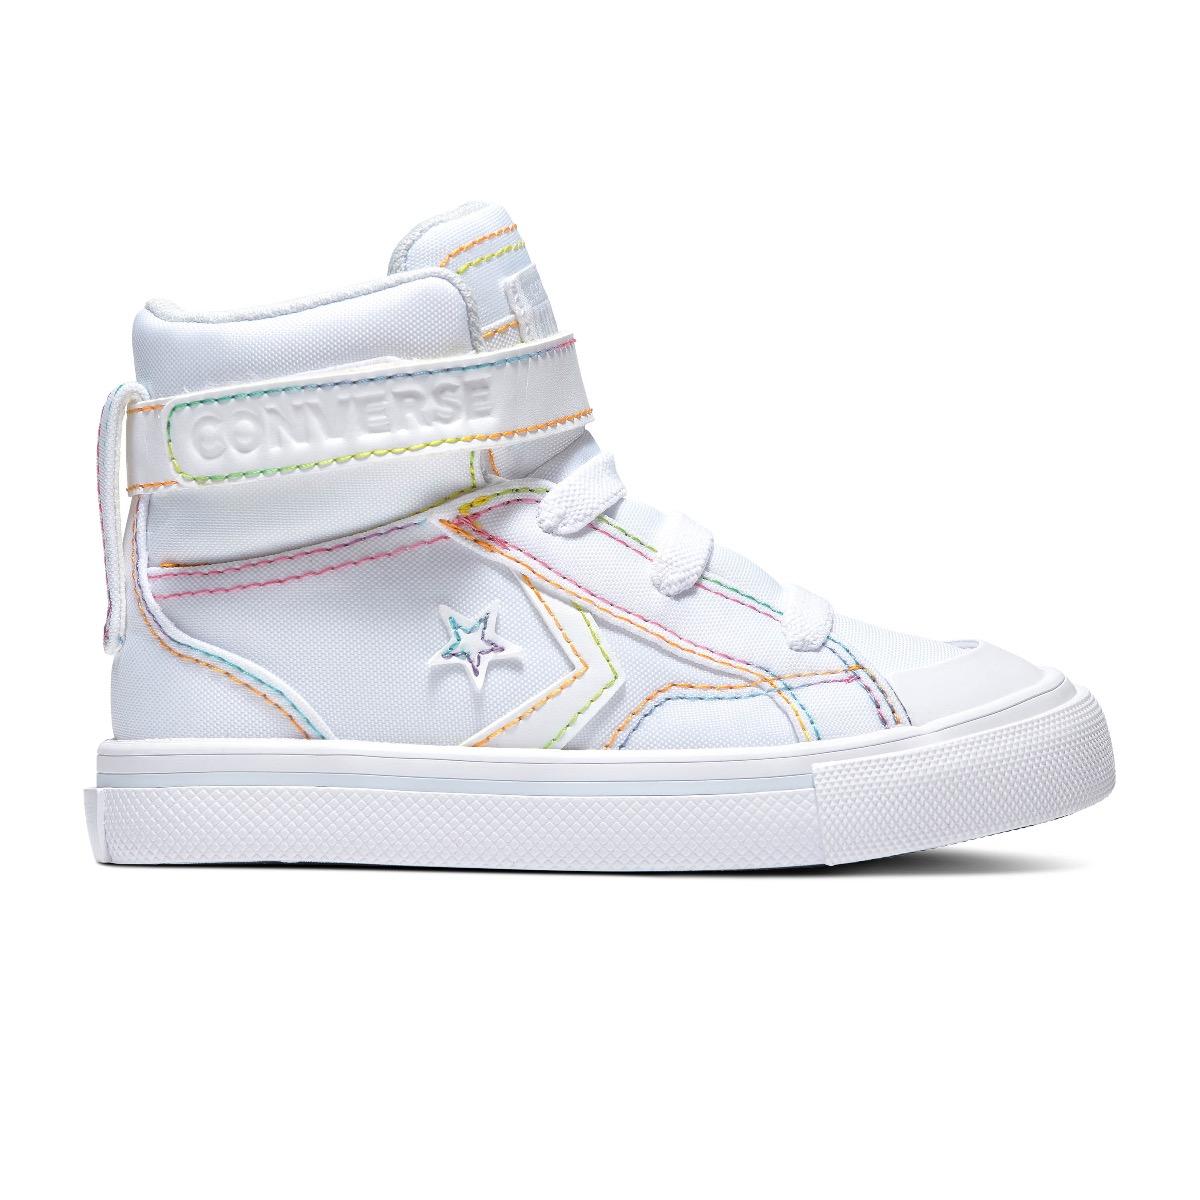 Converse All Stars Rainbow Stitch 765286C Wit-23 maat 23